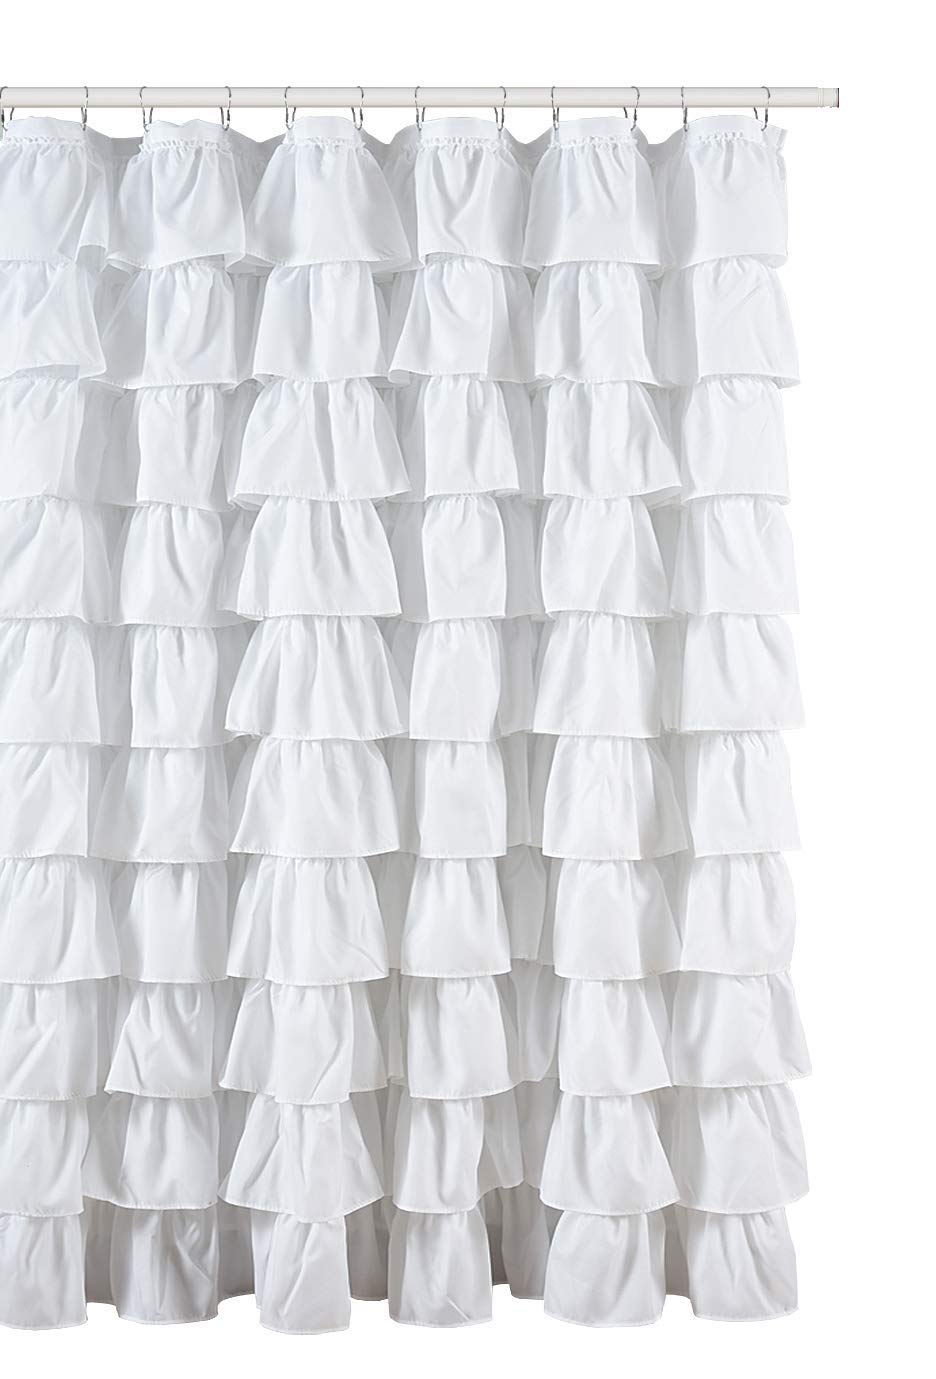 Ruffled White Fabric Shower Curtain Walmart Com Walmart Com